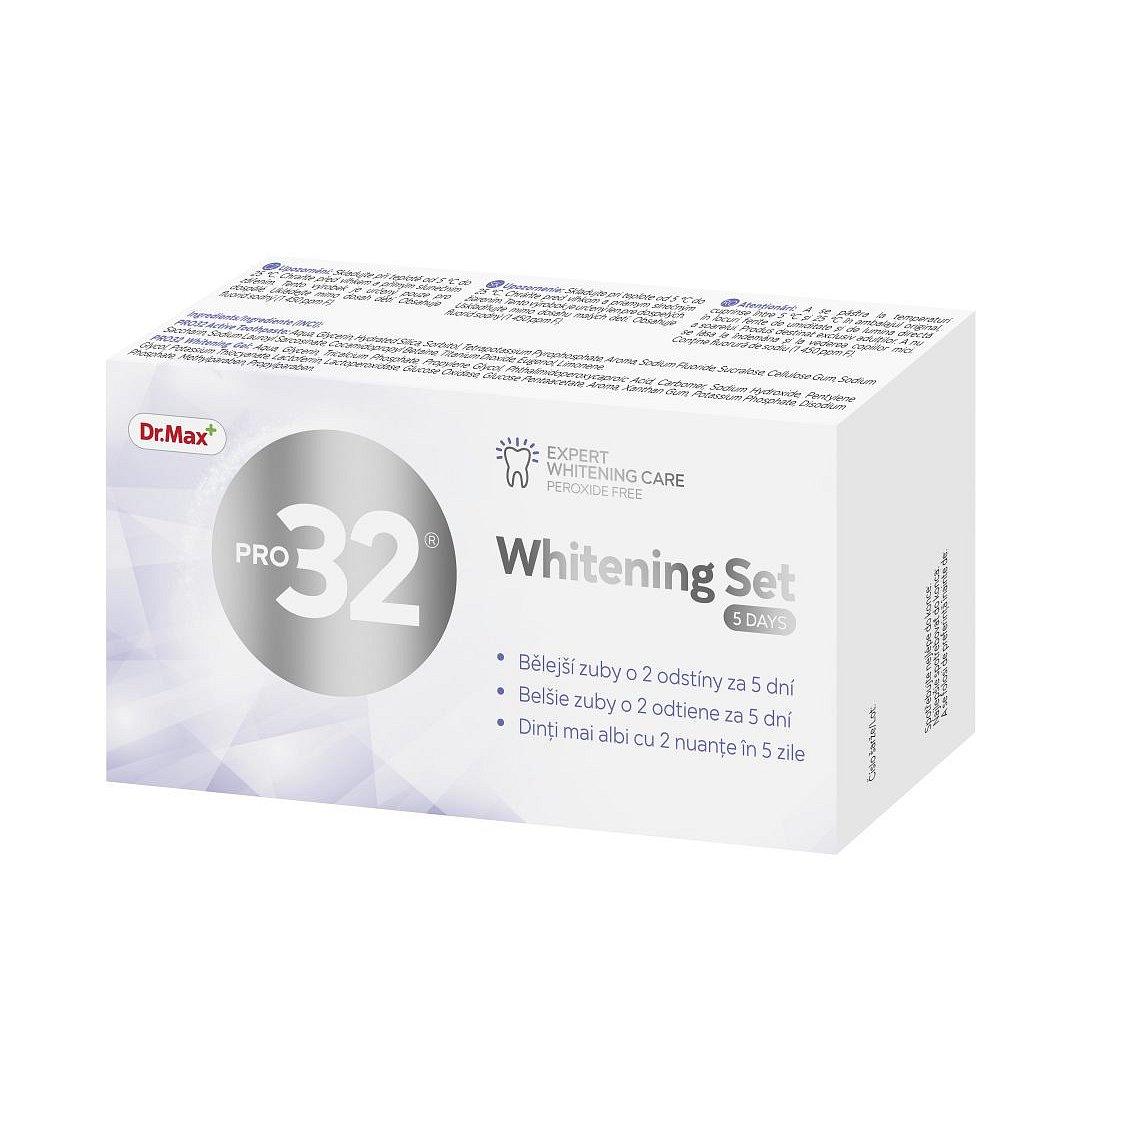 Dr.Max Whitening Set